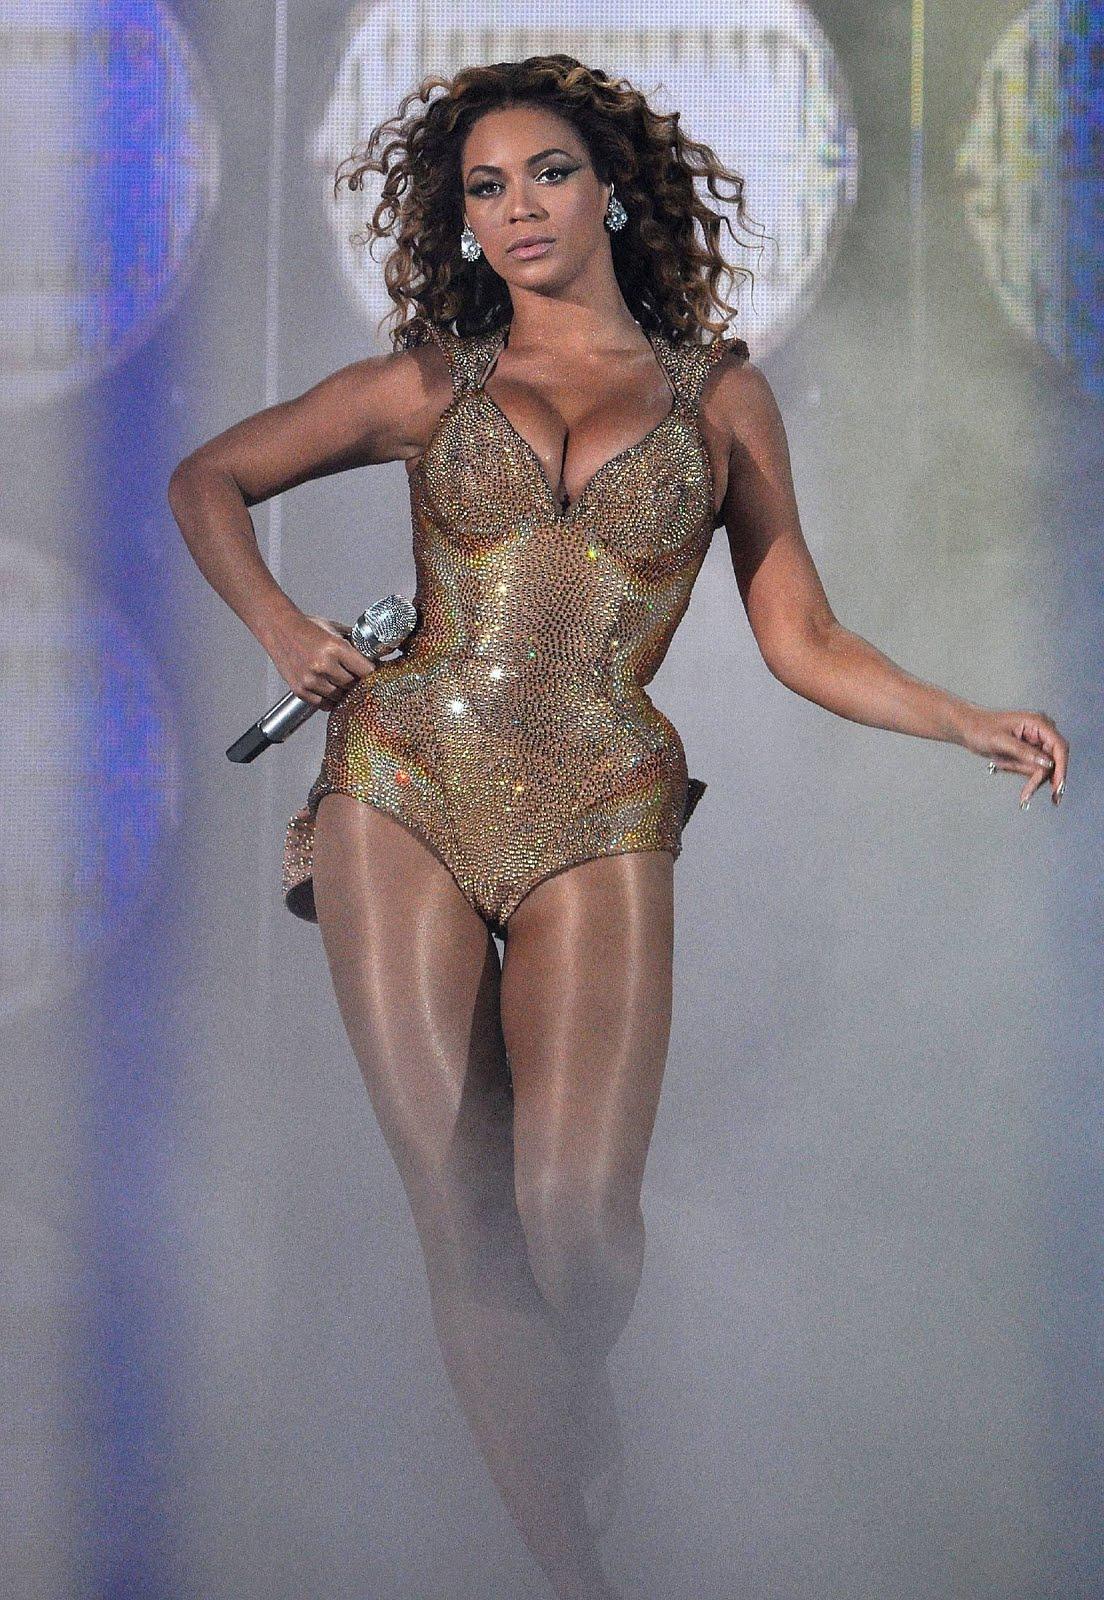 http://3.bp.blogspot.com/-ufAR9kfASdA/Tdq8ZqaqvMI/AAAAAAAAIx0/0qEAWCrlZfI/s1600/52214_Beyonce_Knowles_dressed_1529364_122_802lo.jpg